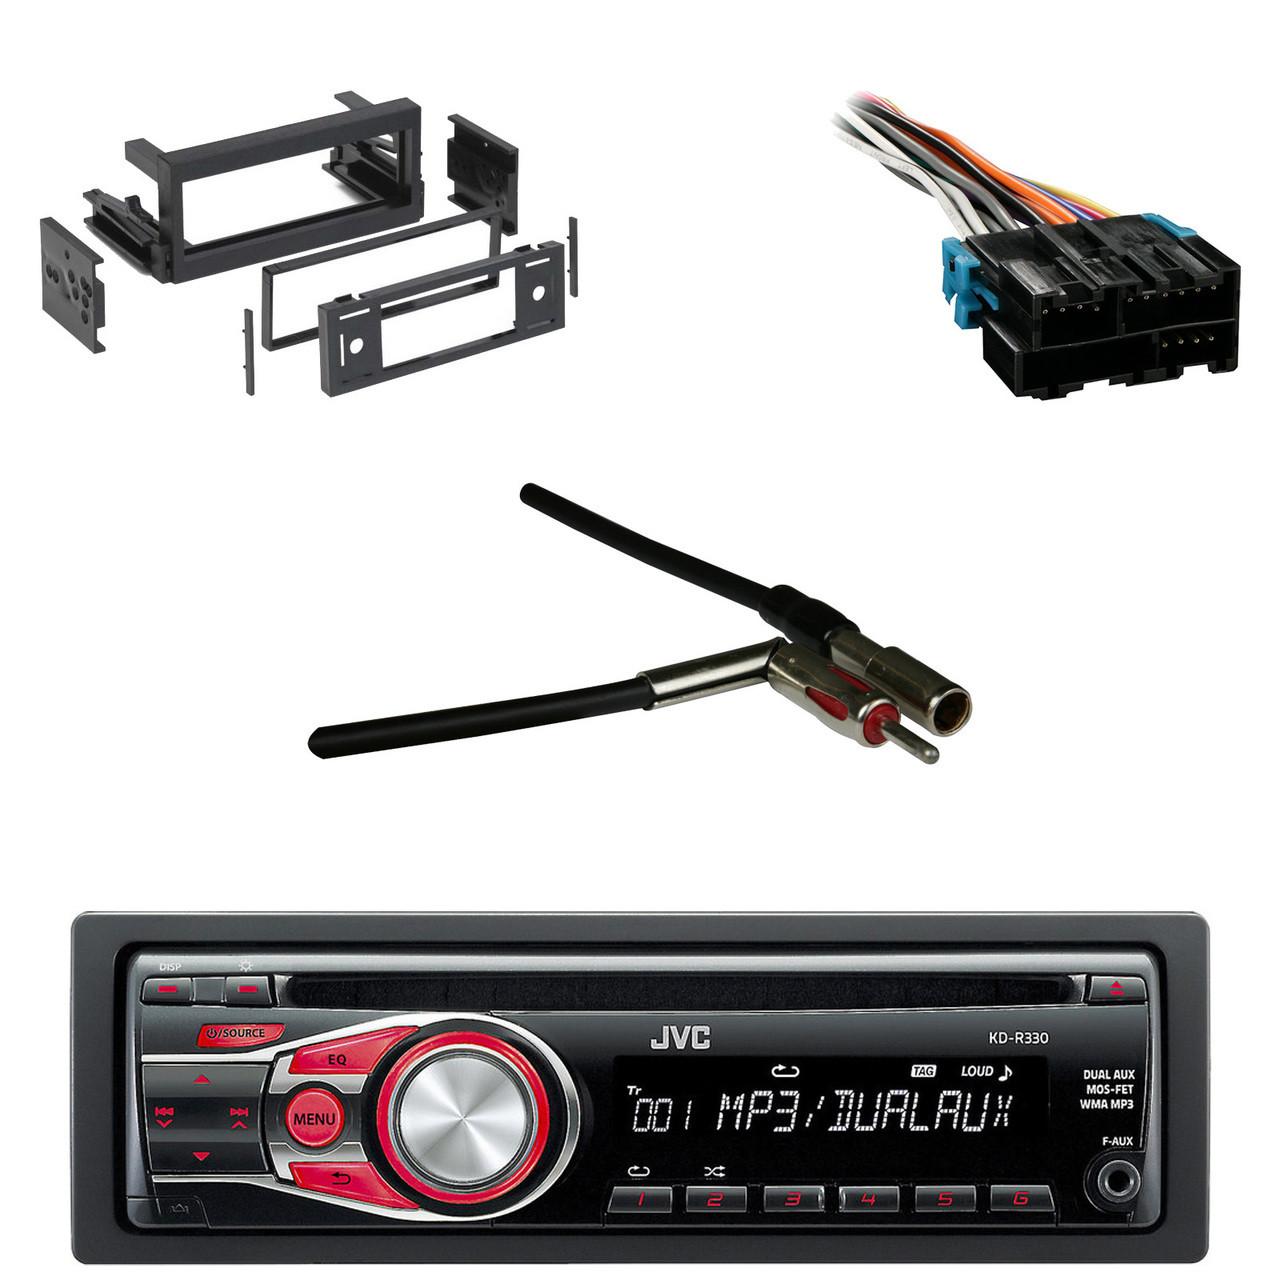 small resolution of jvc kdr330 cd aux car radio antenn adapter gm wire harness gm rh roadentertainment com wiring